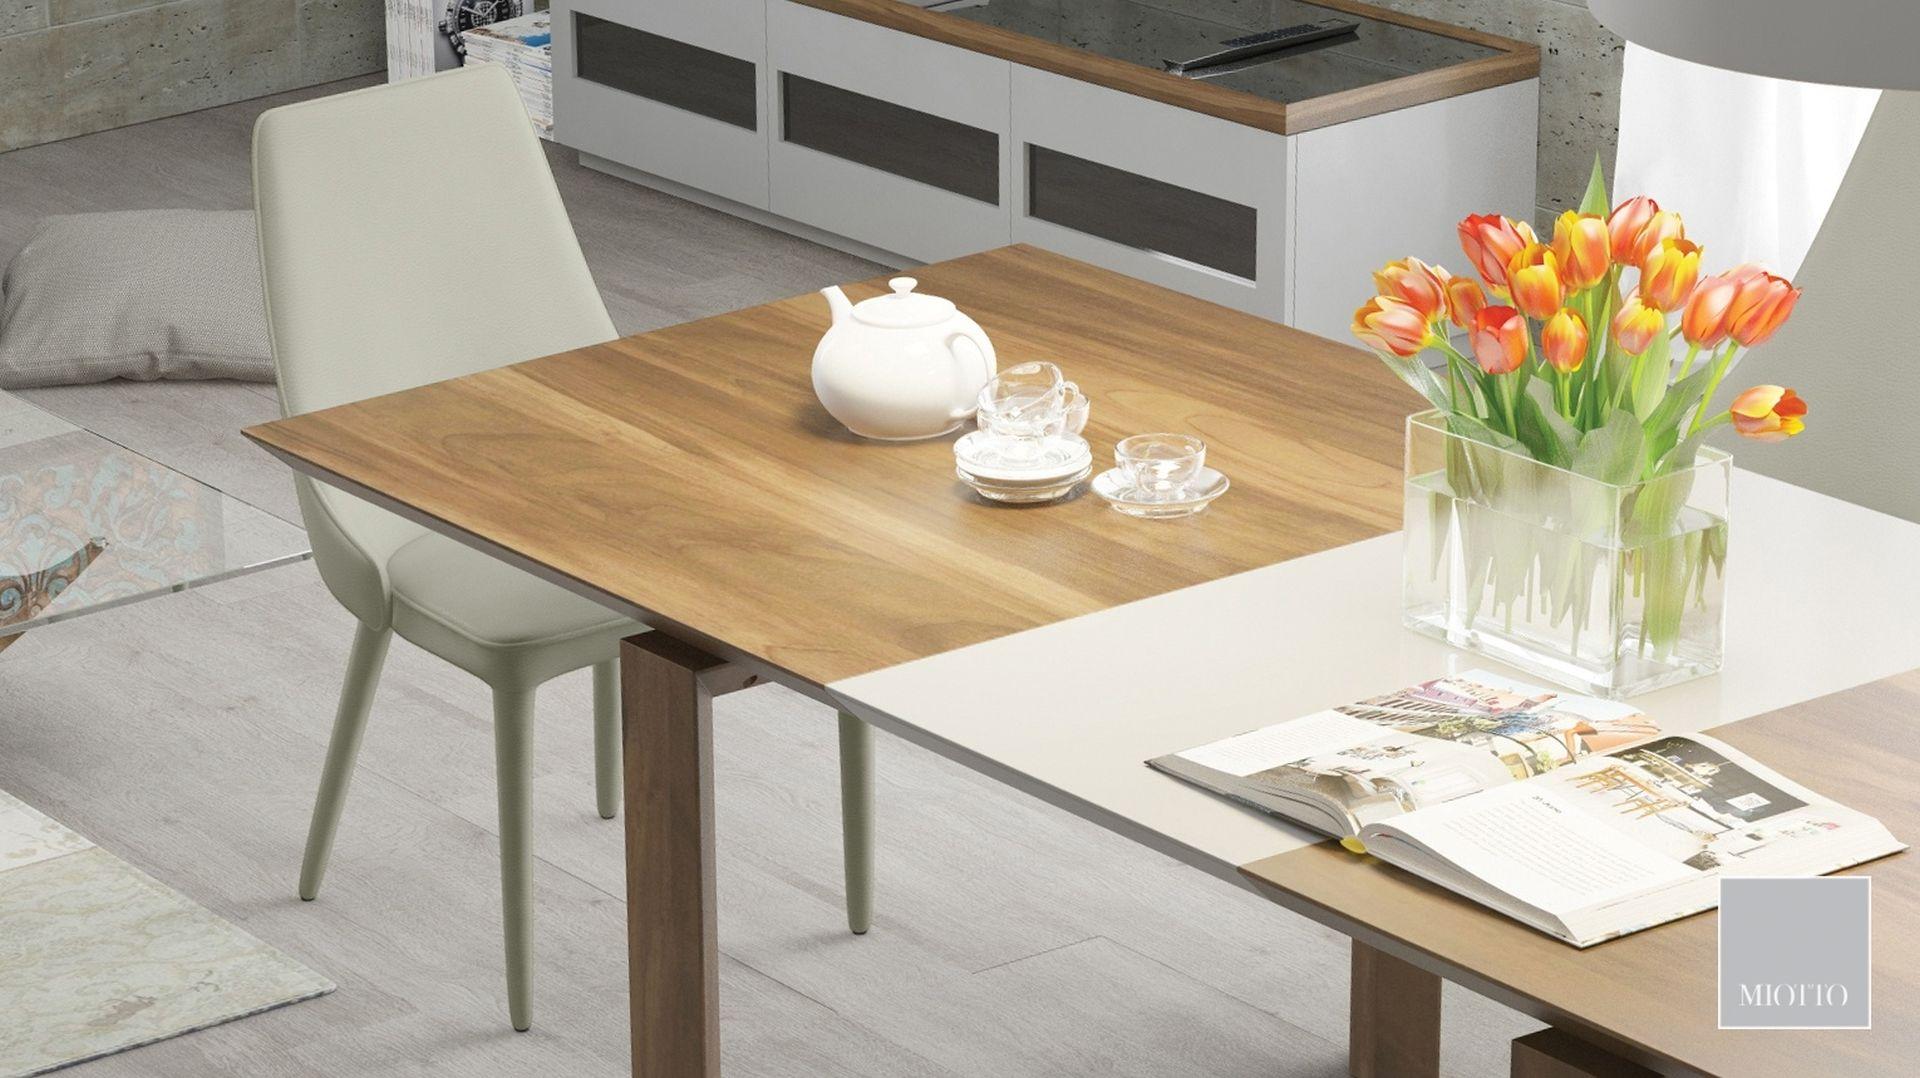 miotto_maino_0001 MIOTTO design dining chair_w